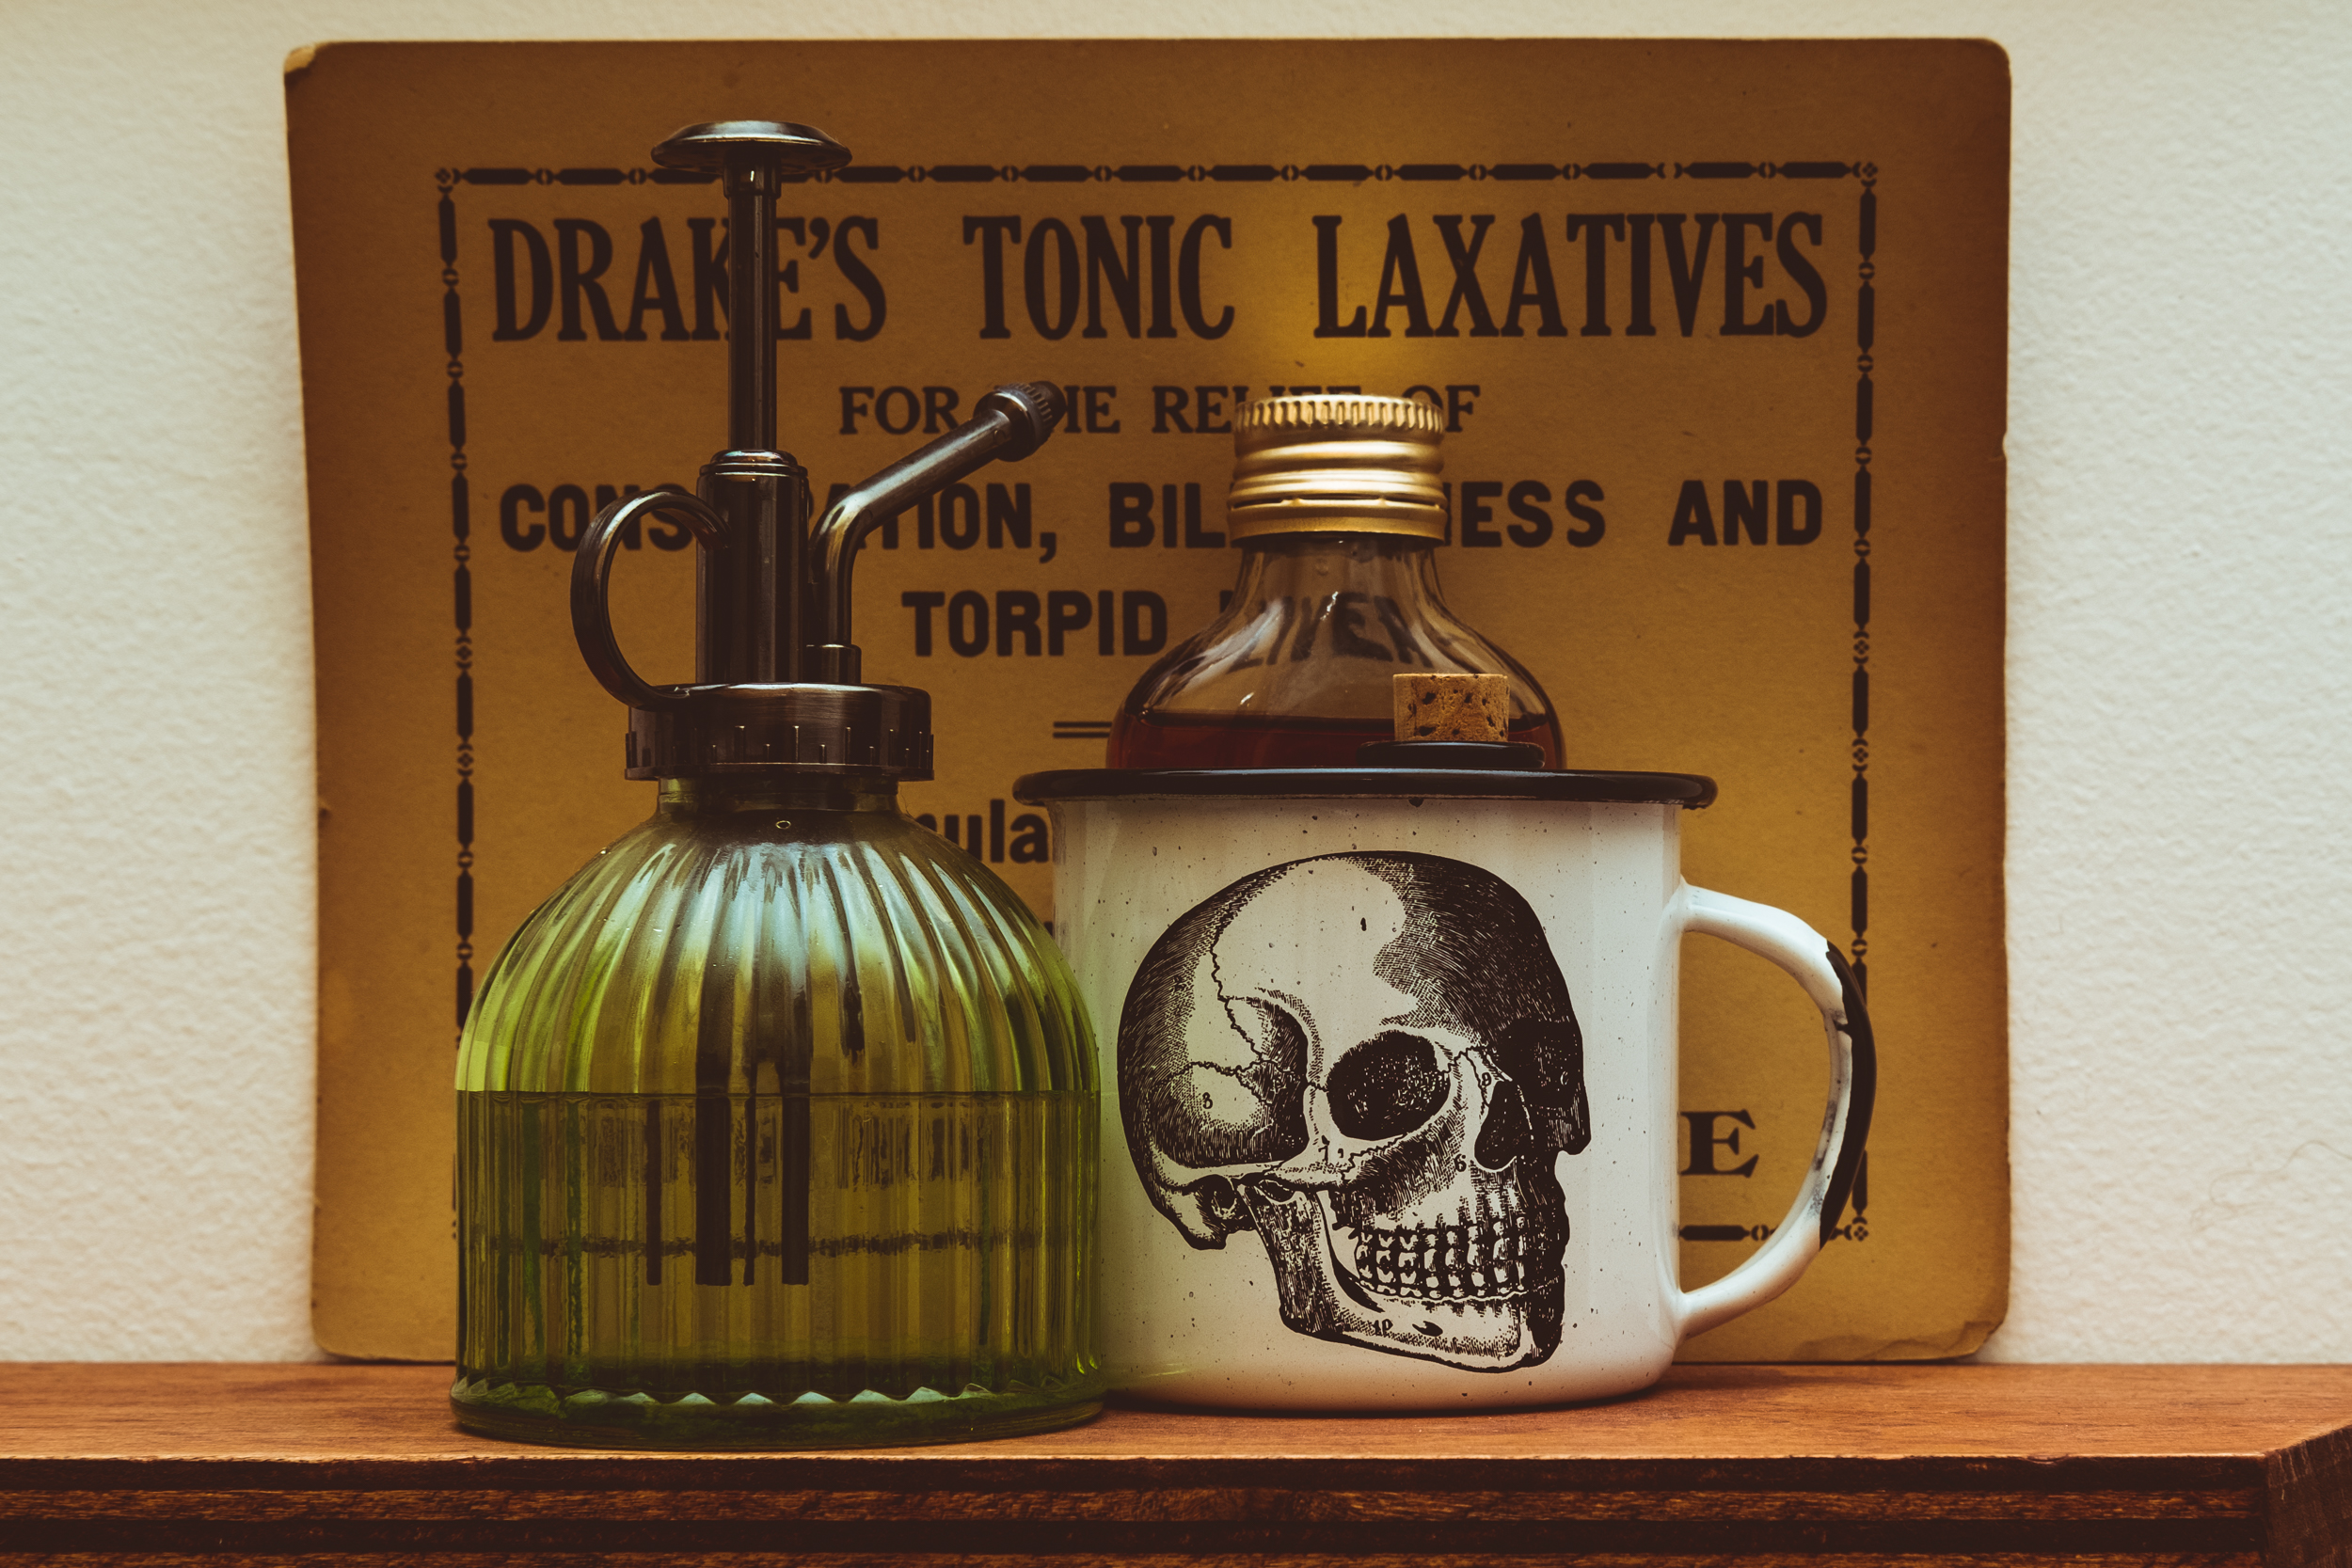 EH2490_Drakes-Tonic-Laxatives.jpg